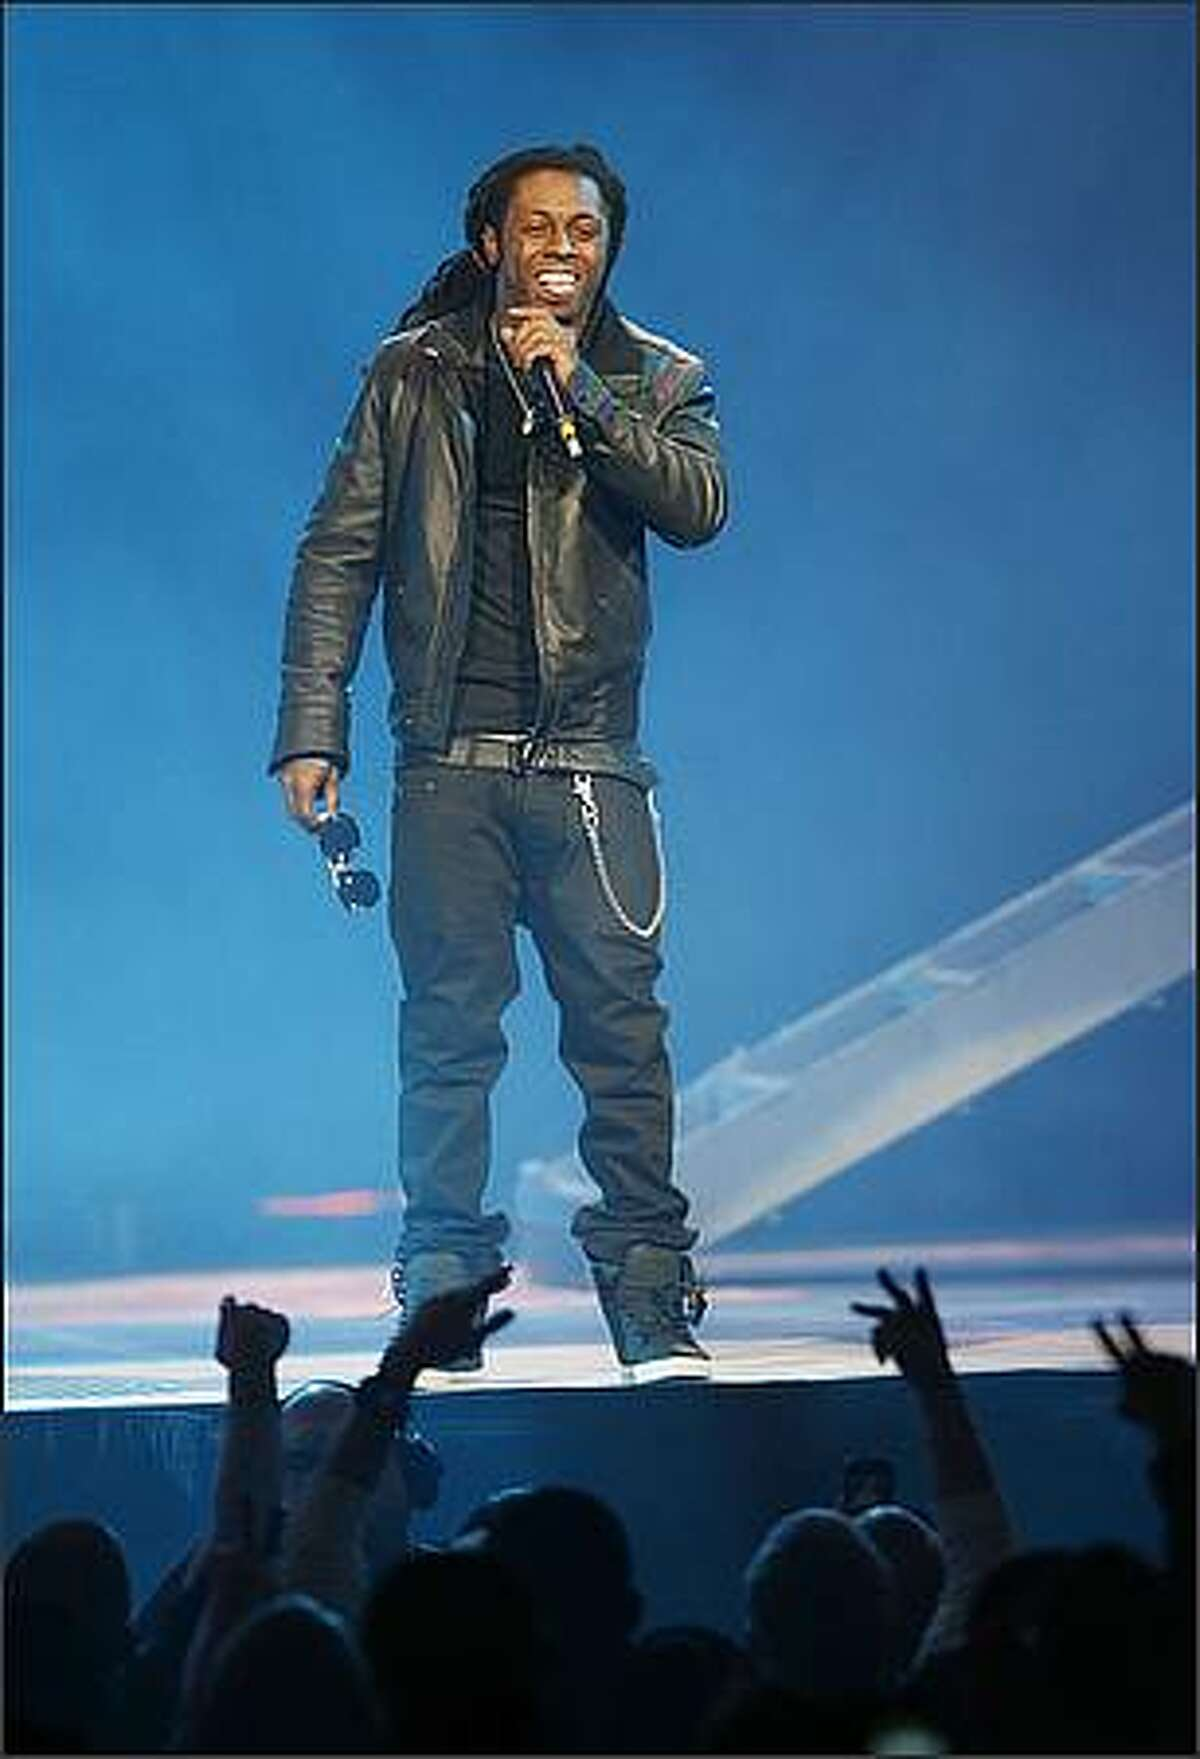 Lil Wayne performs at KeyArena in Seattle on Sunday, January 25, 2009.